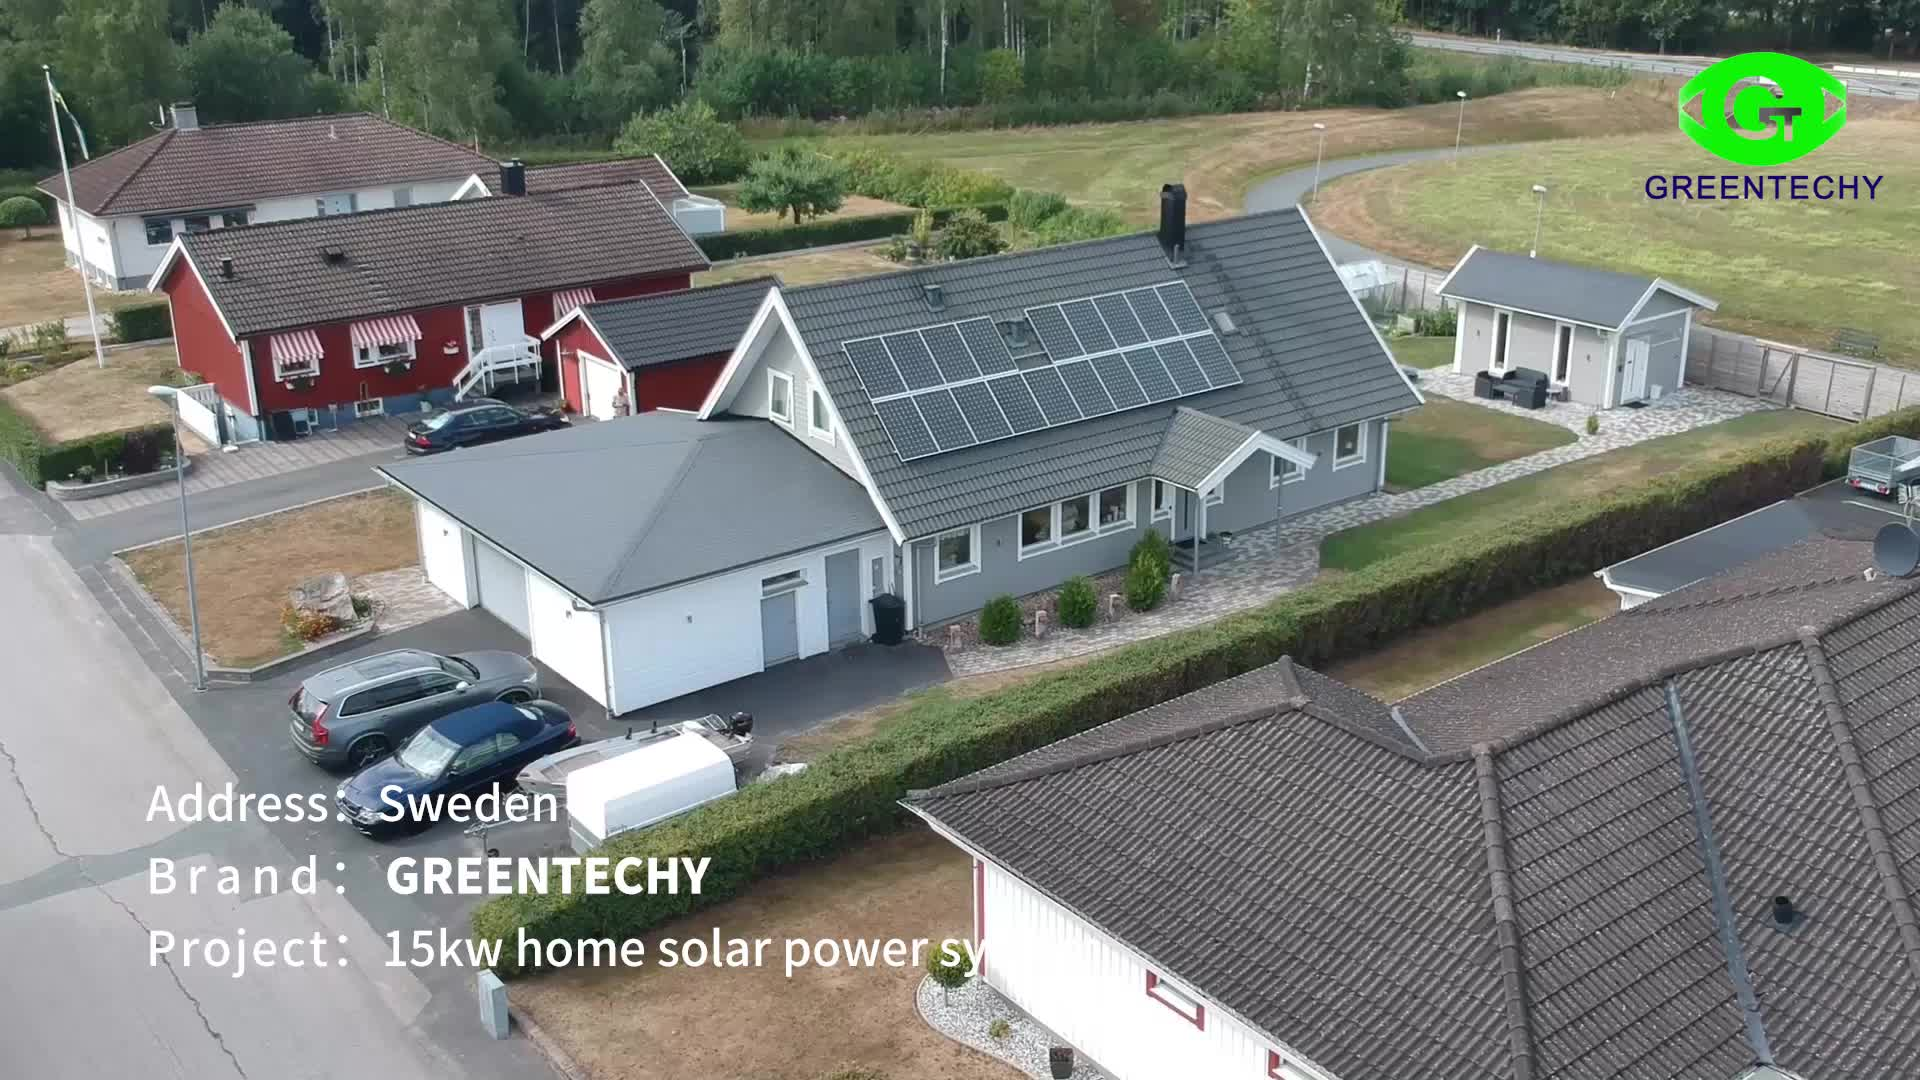 3KW พลังงานแสงอาทิตย์ hybrid ระบบไฟ 48 v 1kw เครื่องกำเนิดไฟฟ้ากังหันลม 2kw พลังงานแสงอาทิตย์สำหรับ home